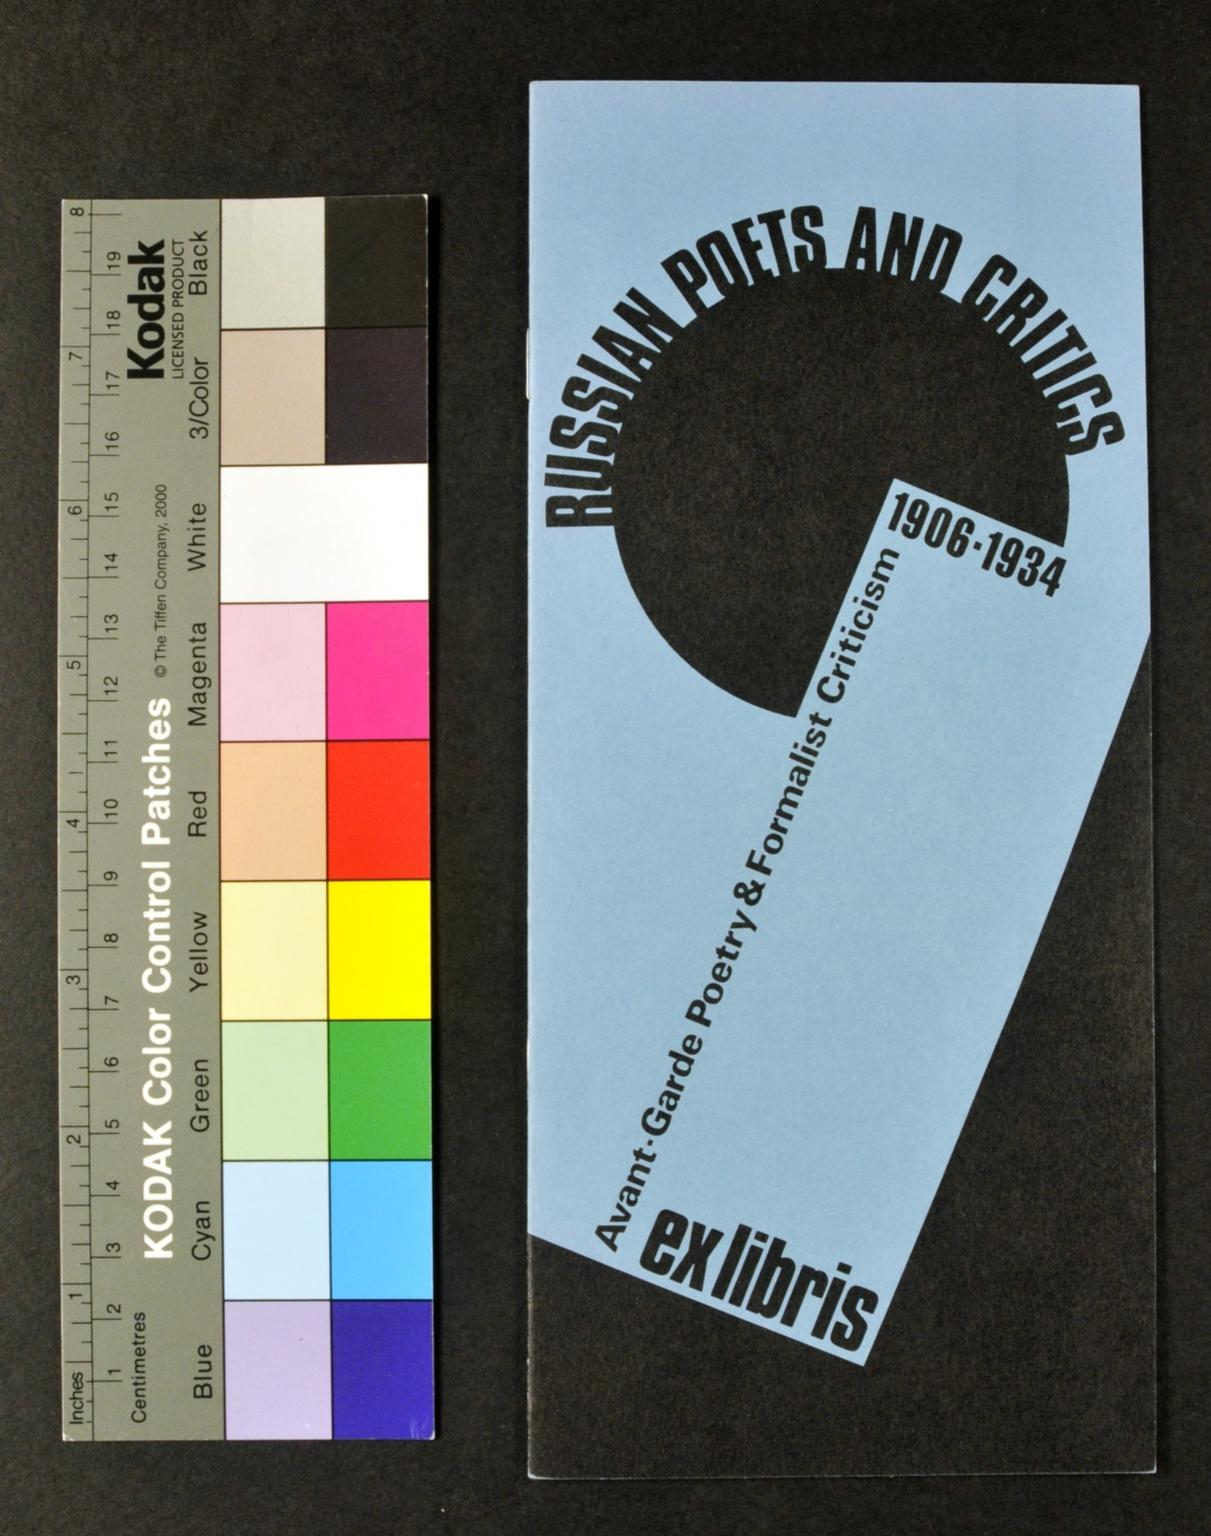 Russian poets and critics: Avant-garde poetry & formalist criticism, 1906-1934